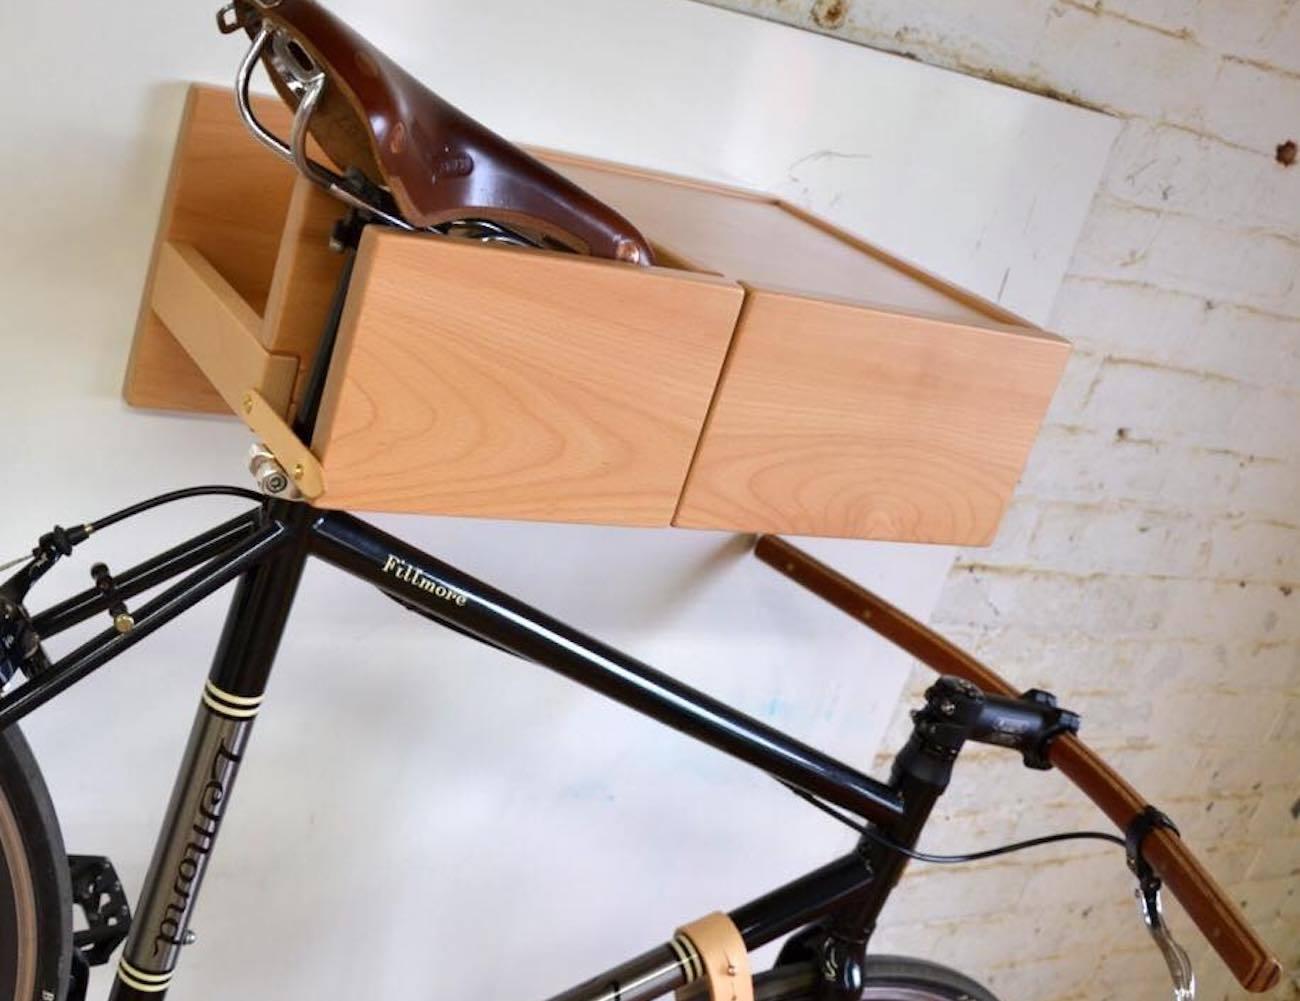 Zadel Bike Rack by Lignum